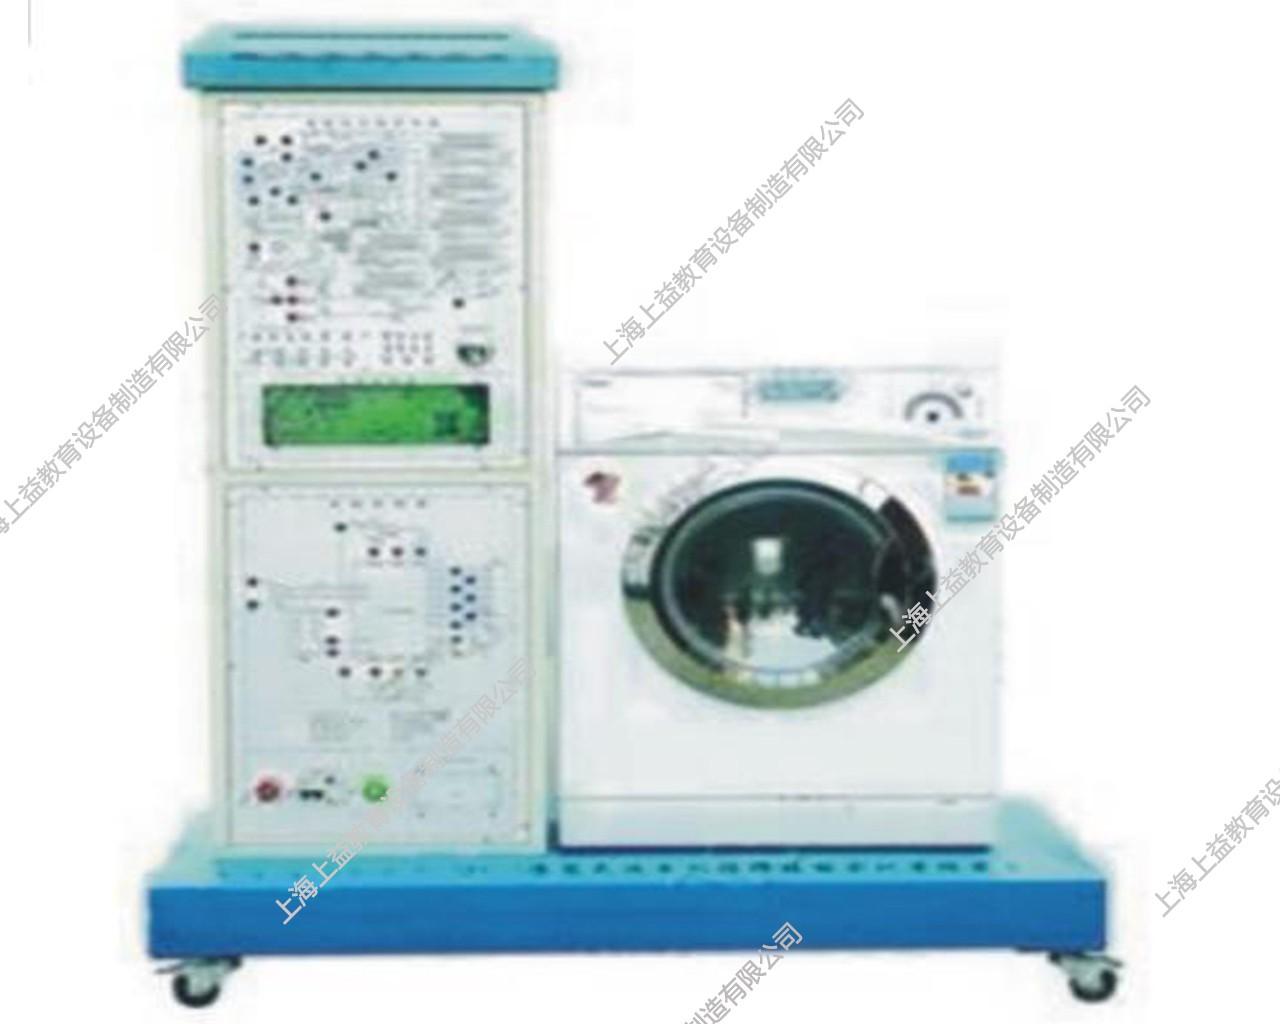 SYJYD-G5滚筒式洗衣机维修技能wwwlehu8viplehu68vip装置